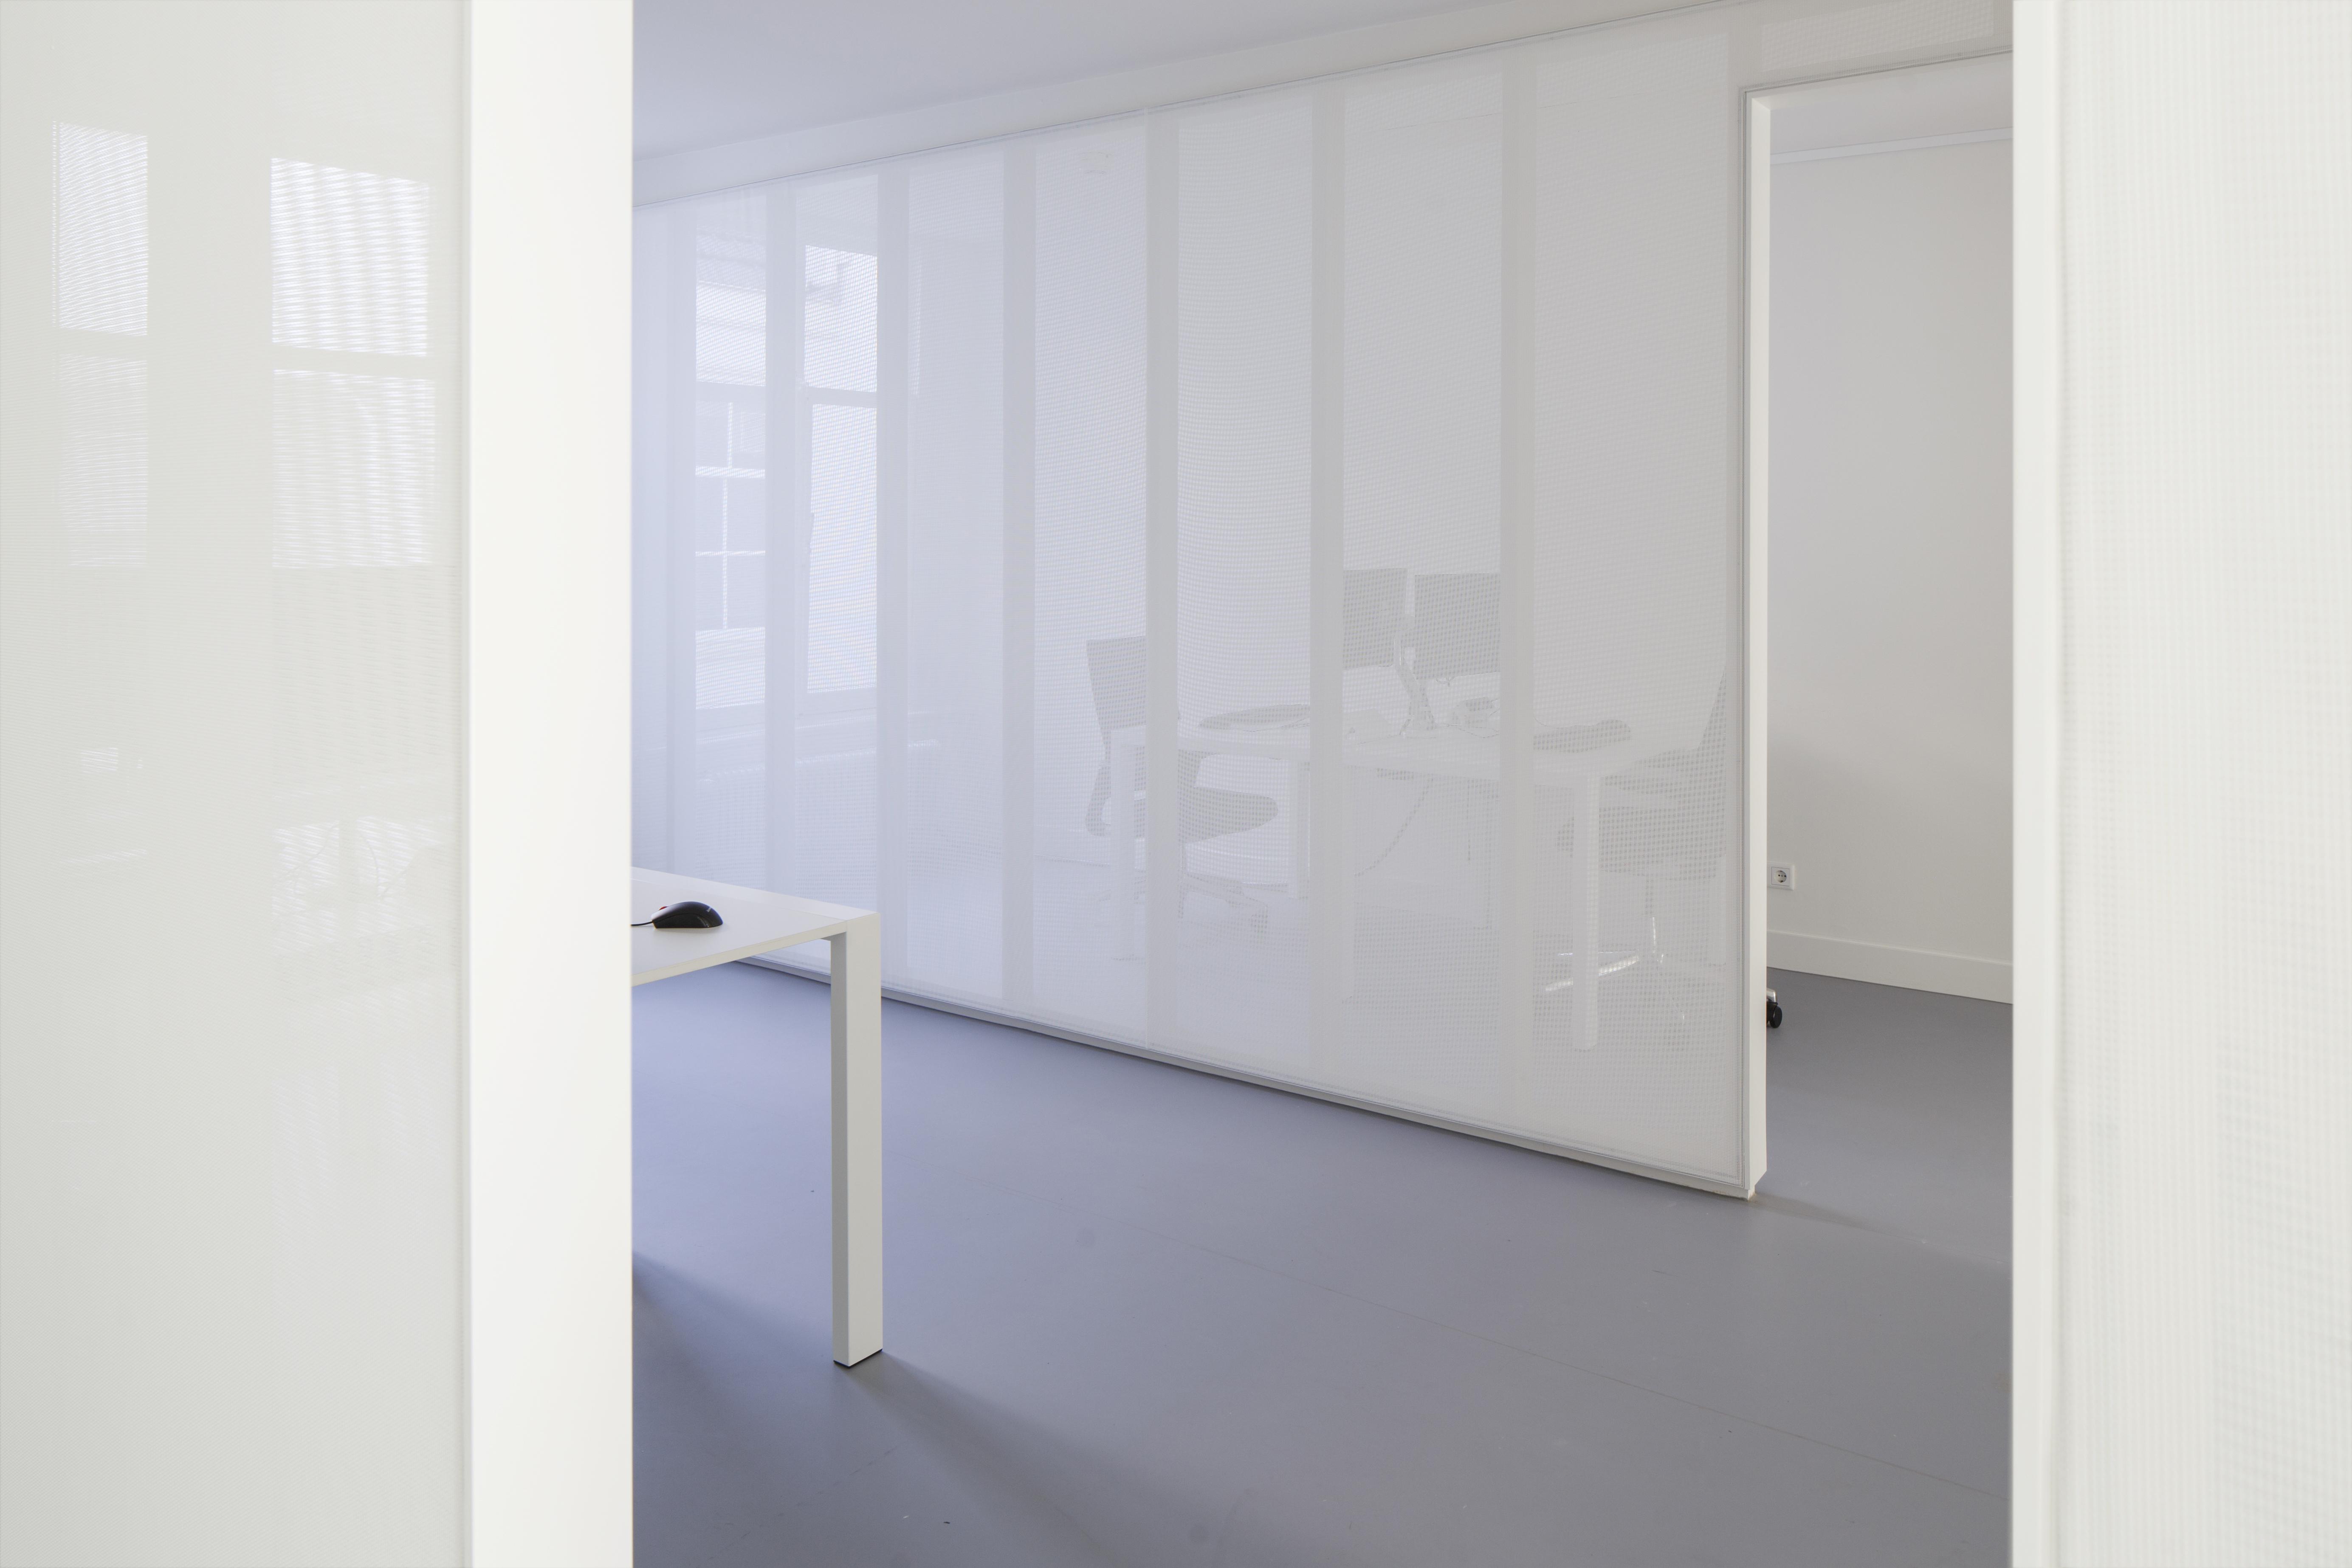 <p>De Witte Ruimte &#8211; foto: Jordi Huisman</p>